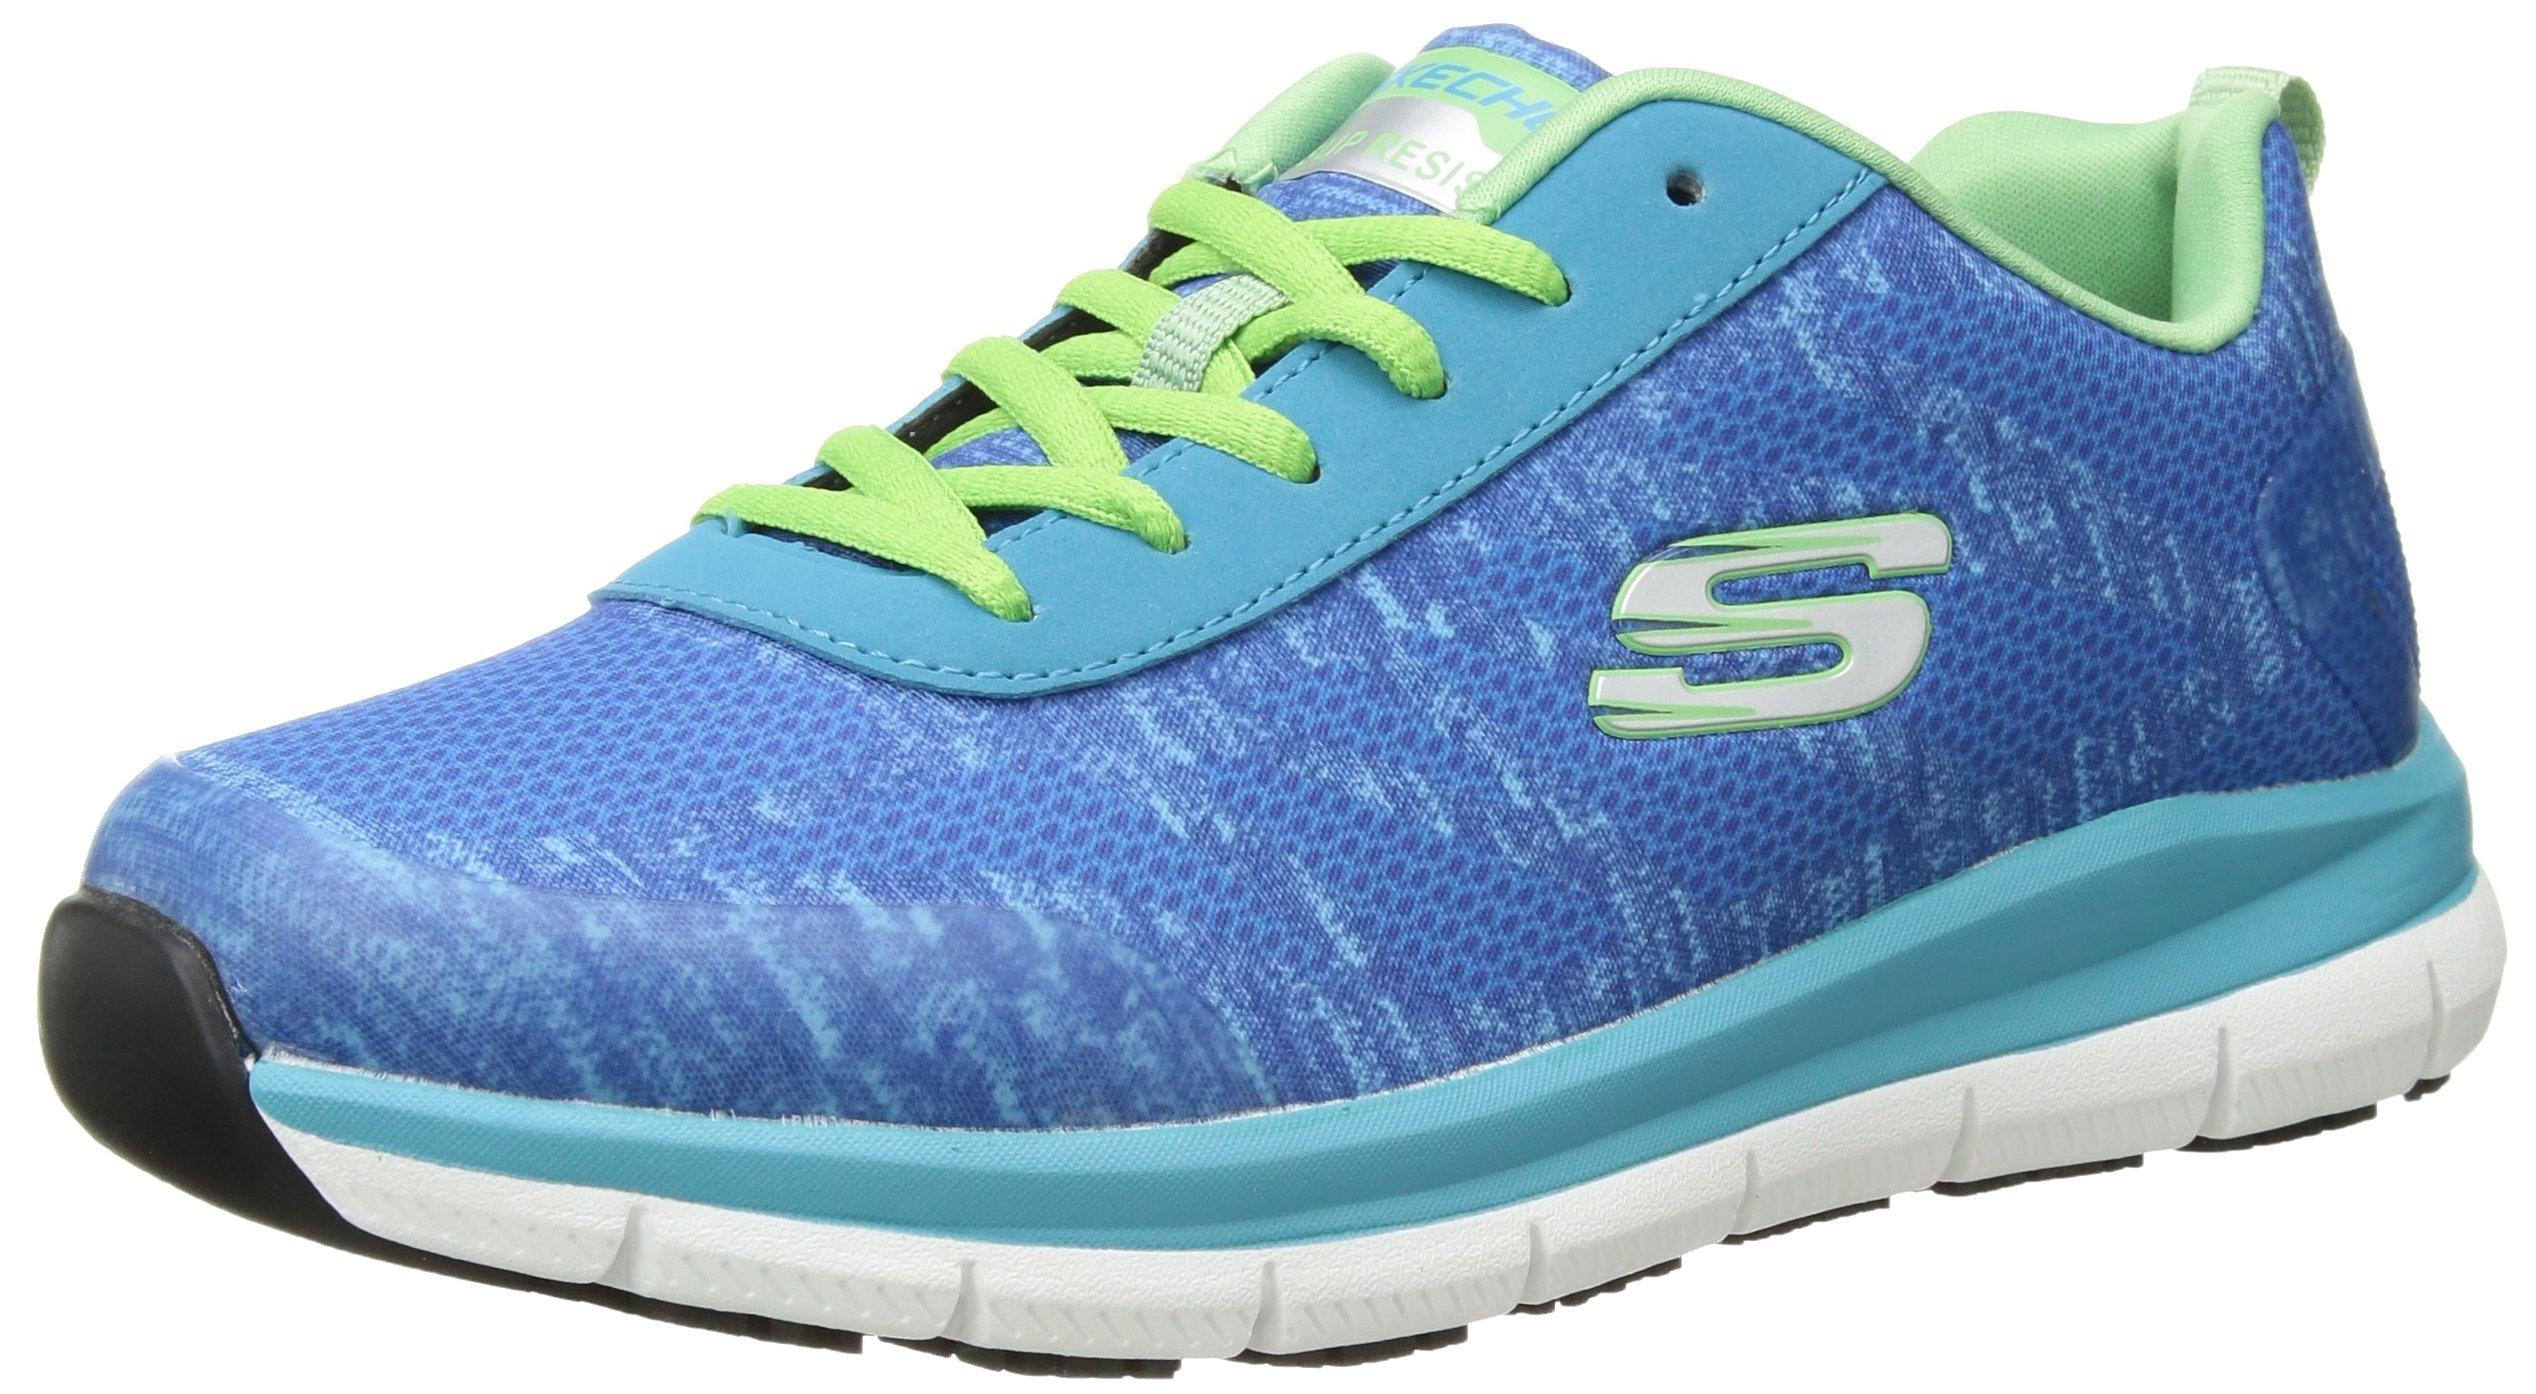 Skechers Women's Comfort Flex Sr Hc Pro Health Care Professional Shoe,Light Blue/Green,6.5 Wide US